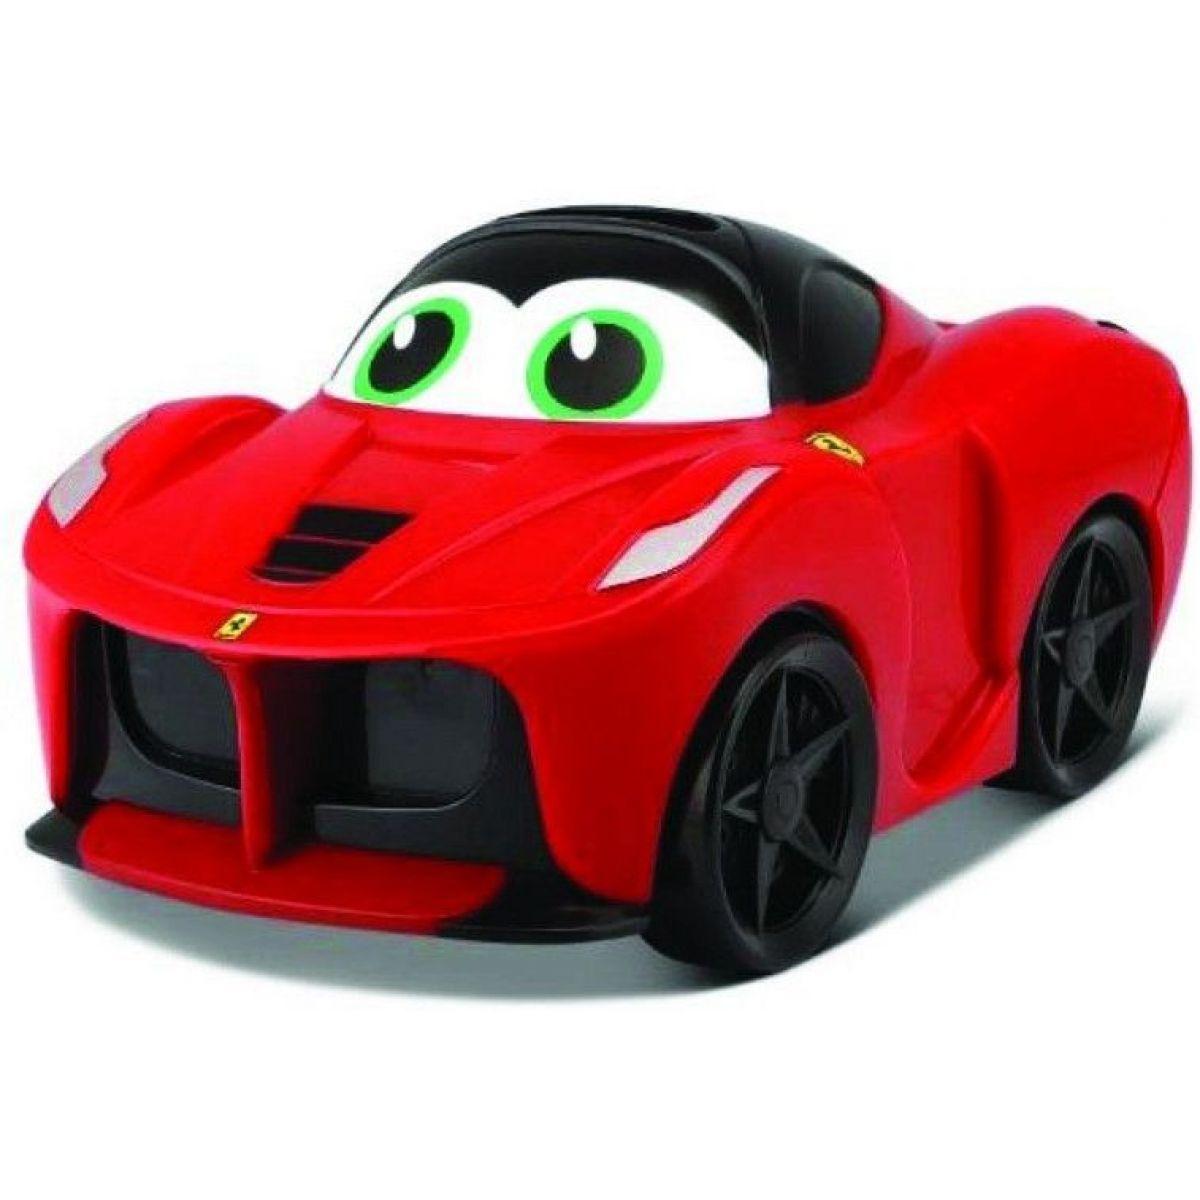 Motorama RC Auto Ferrari F1 Infra čierna strecha